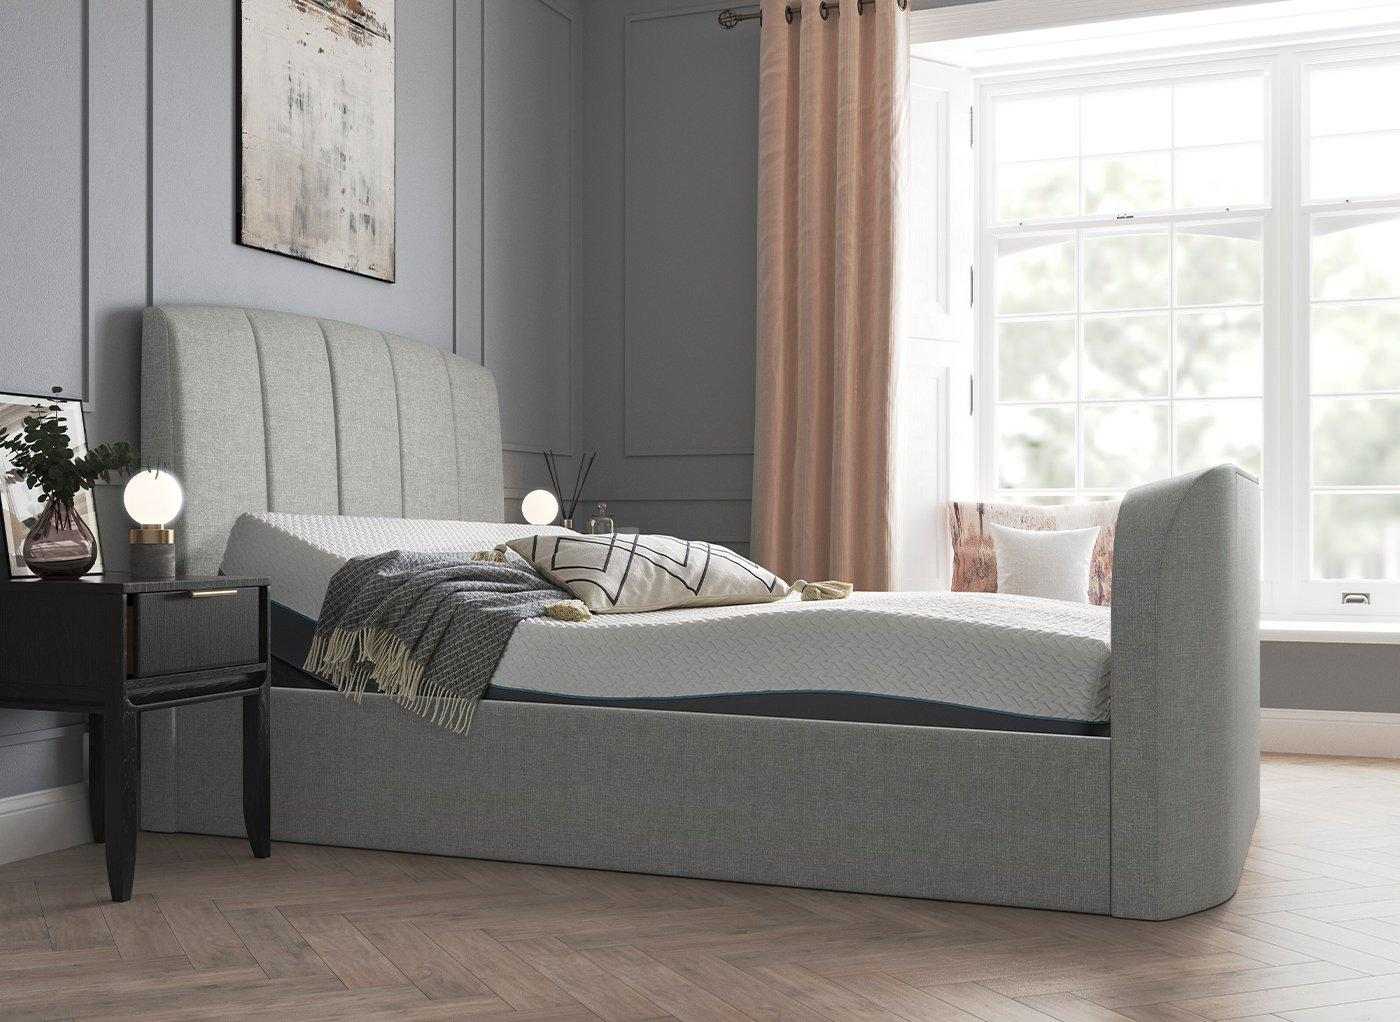 seoul-sleepmotion-200i-adjustable-tv-bed-frame